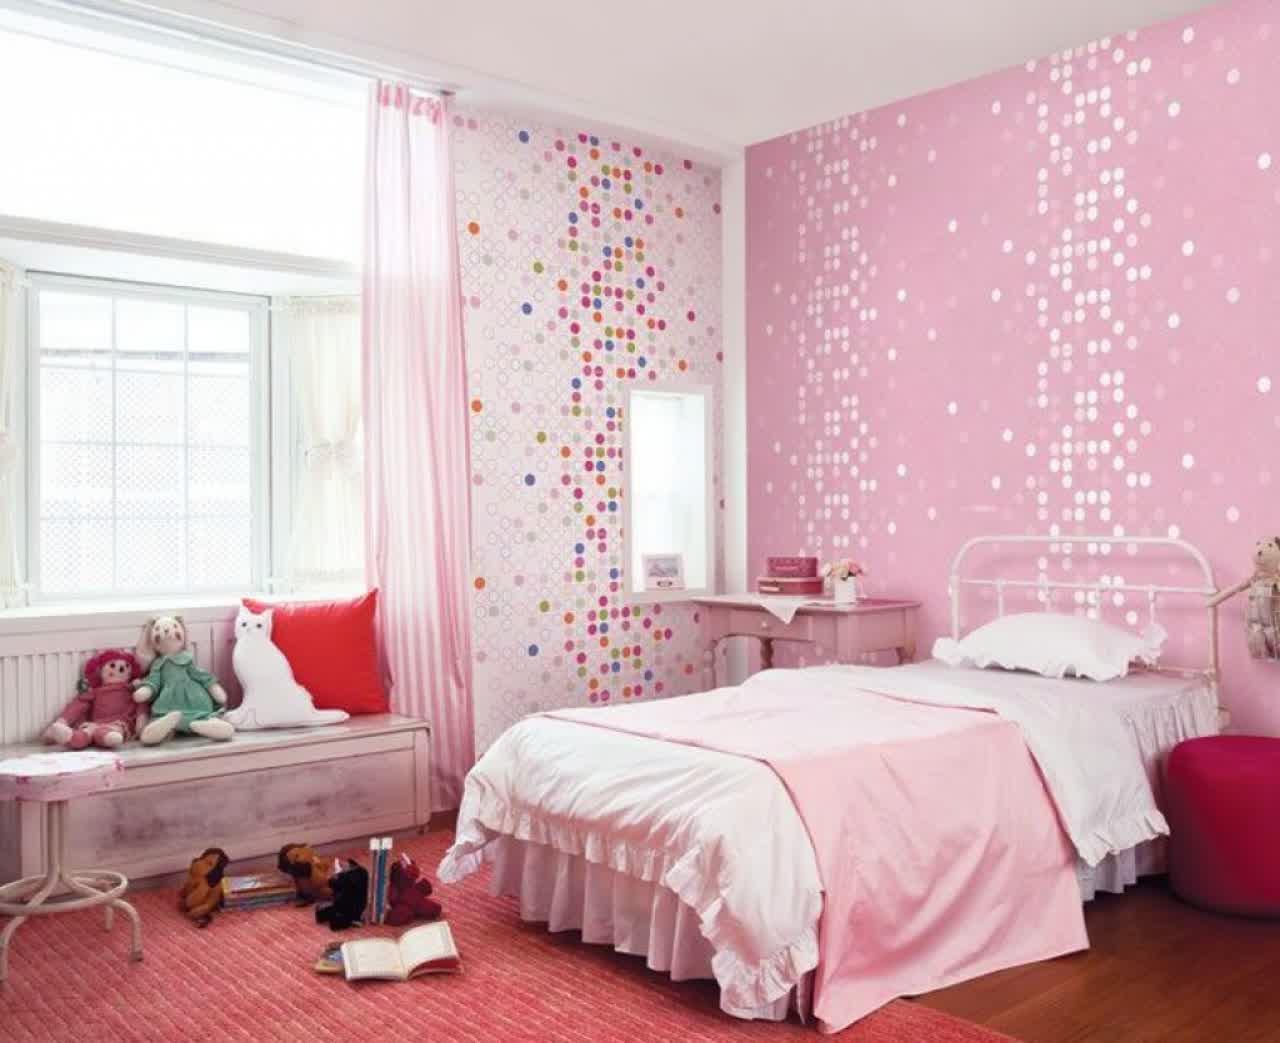 Girly bedroom decoration